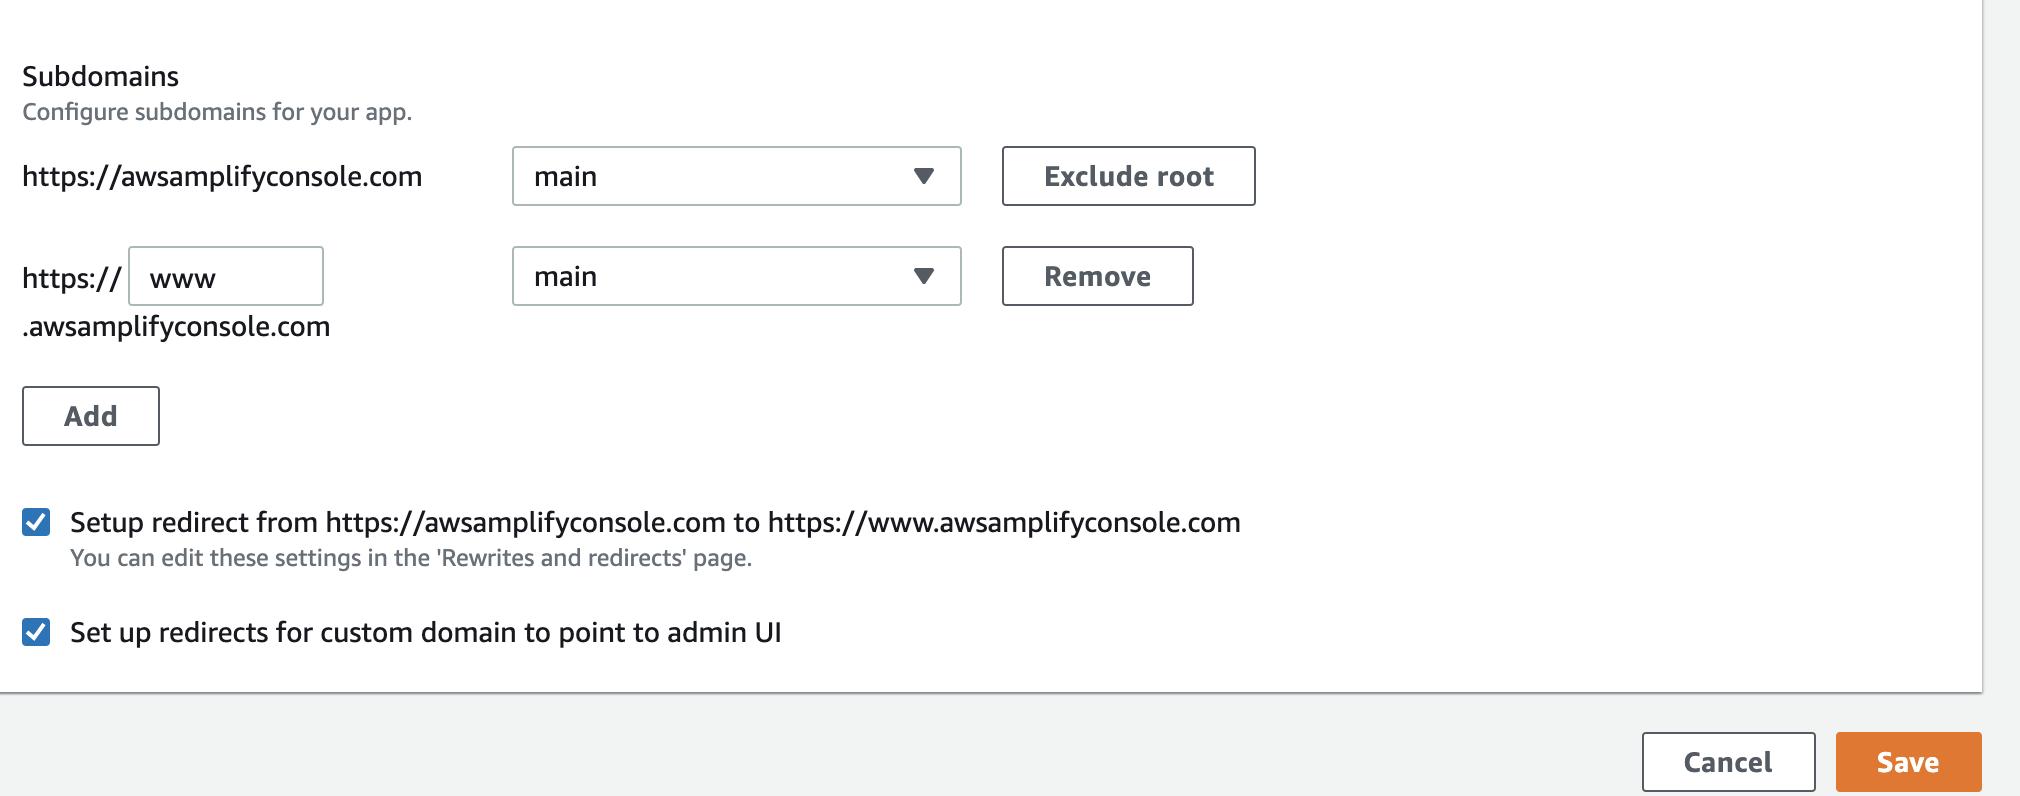 Amplify Console set subdomains